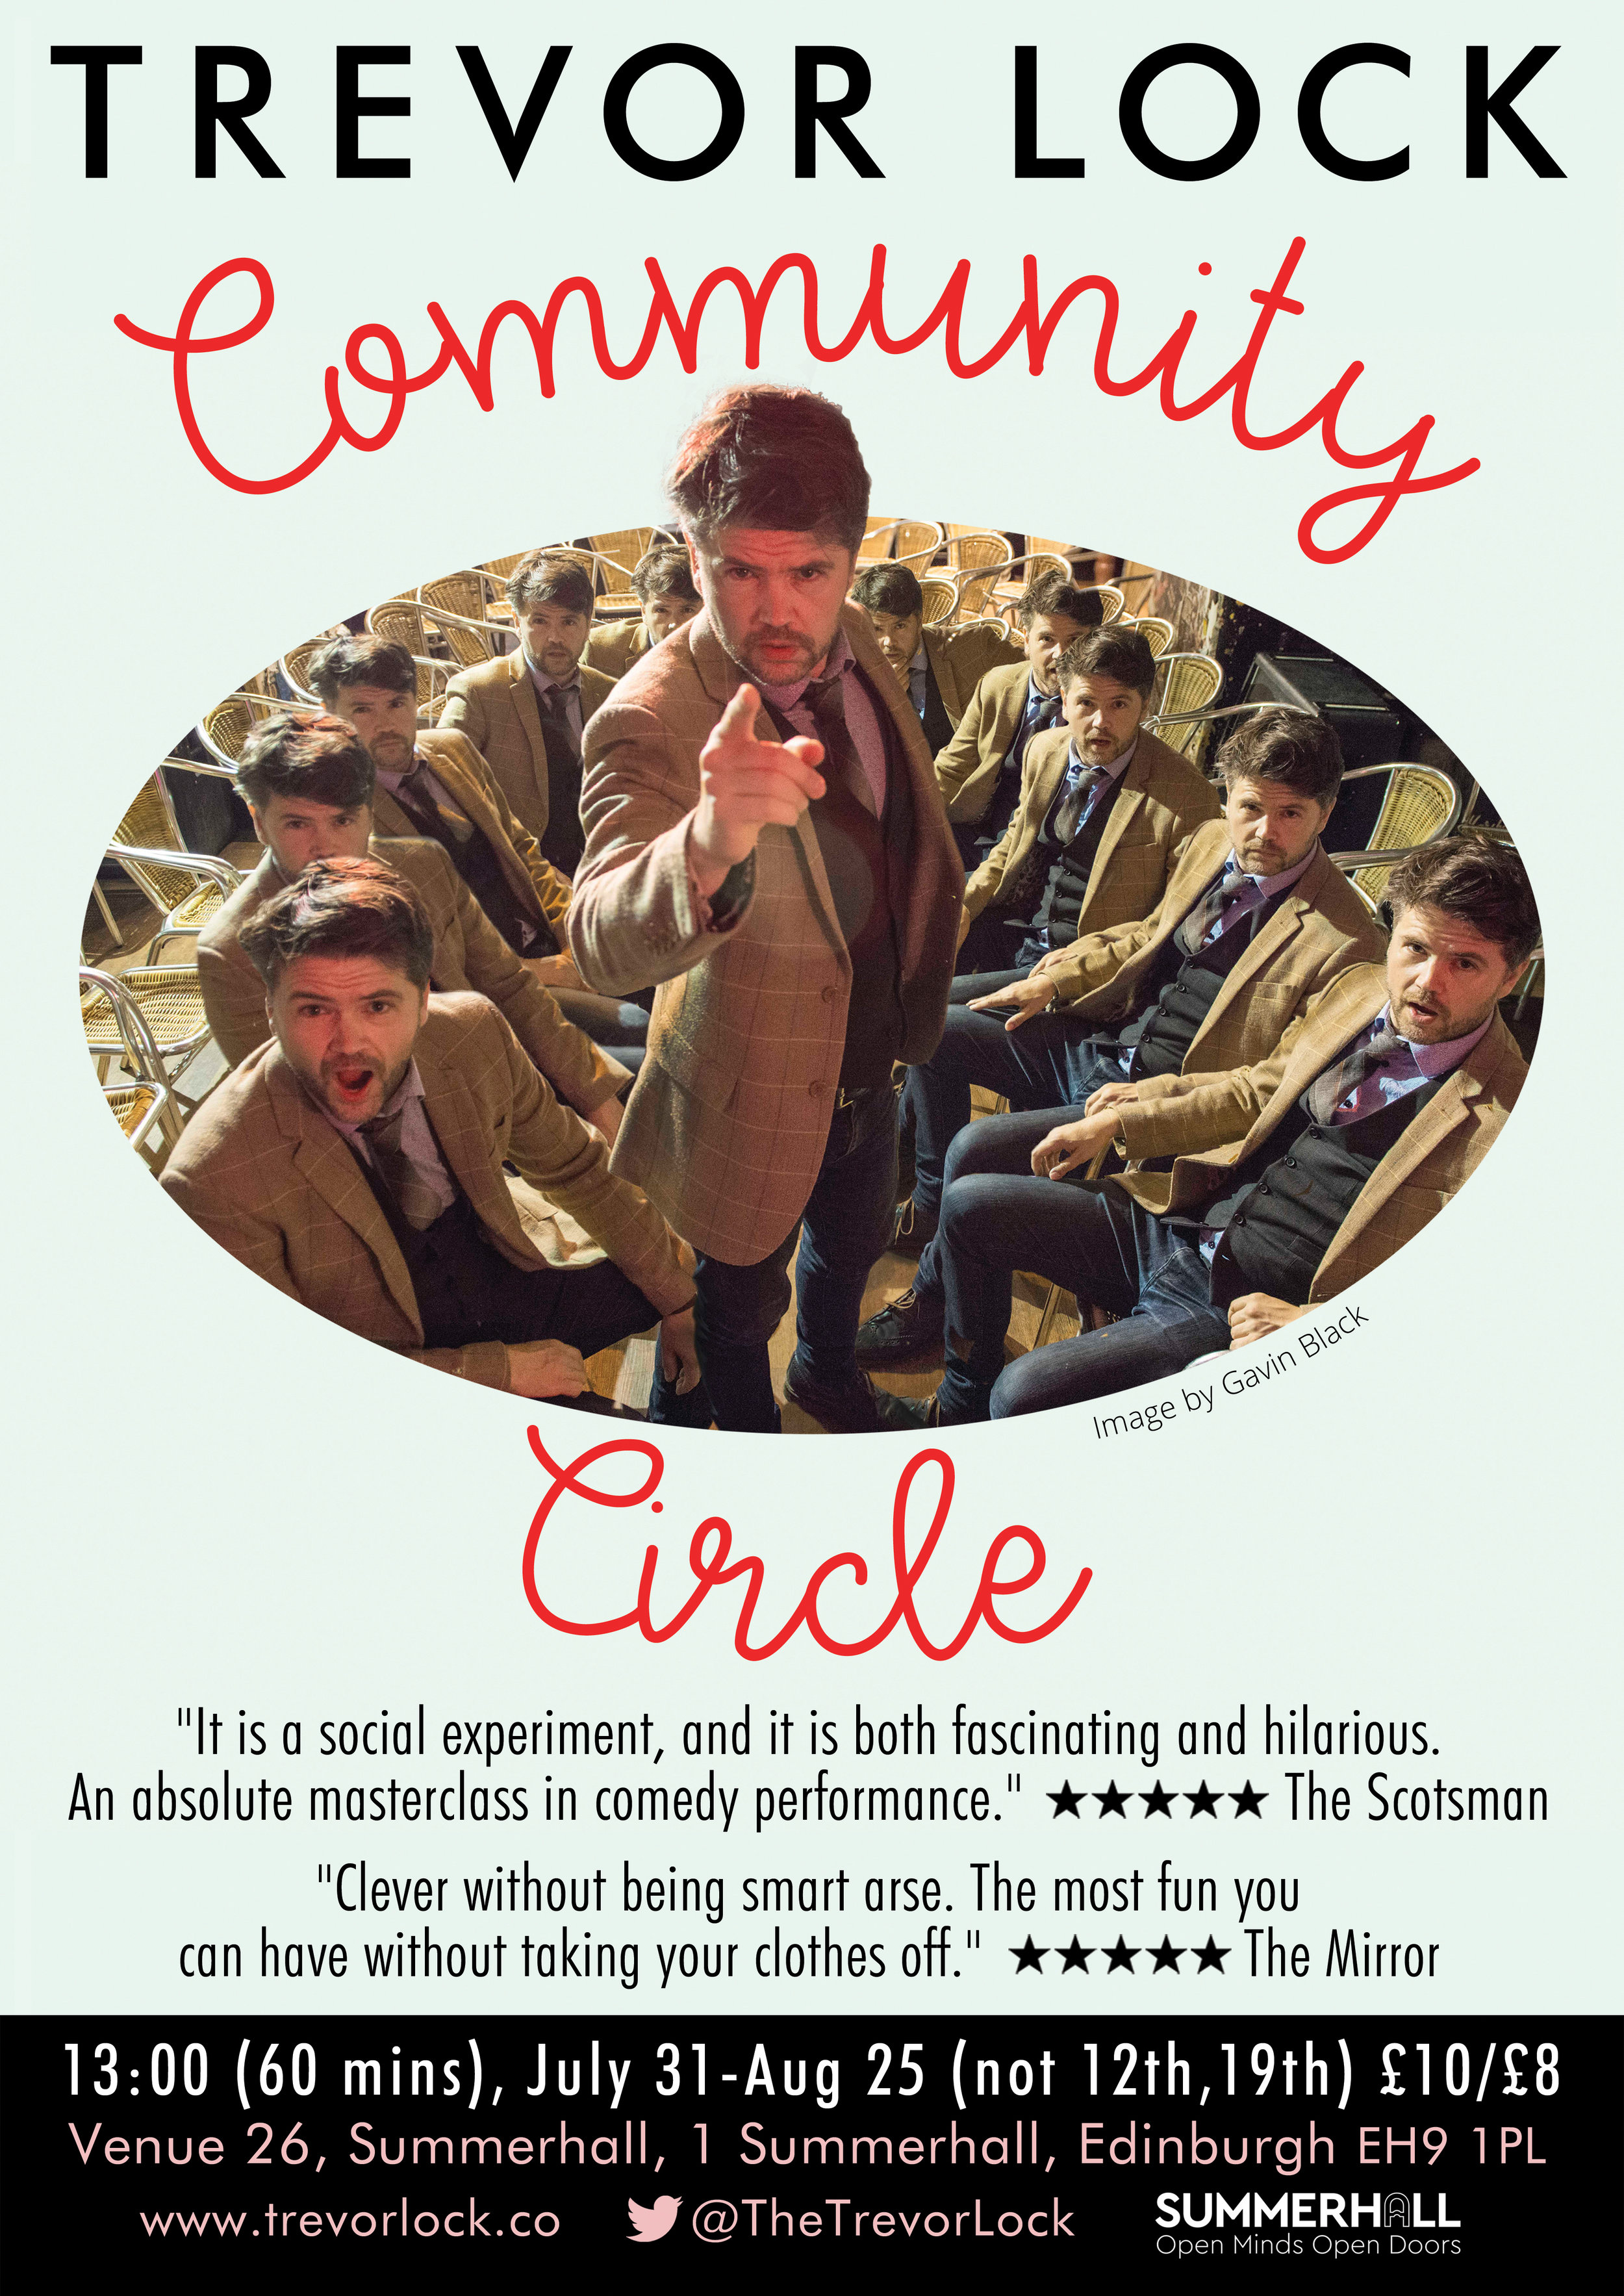 TrevorLockCommunityCircle_FlyerFront-PosterSquare 2.jpg